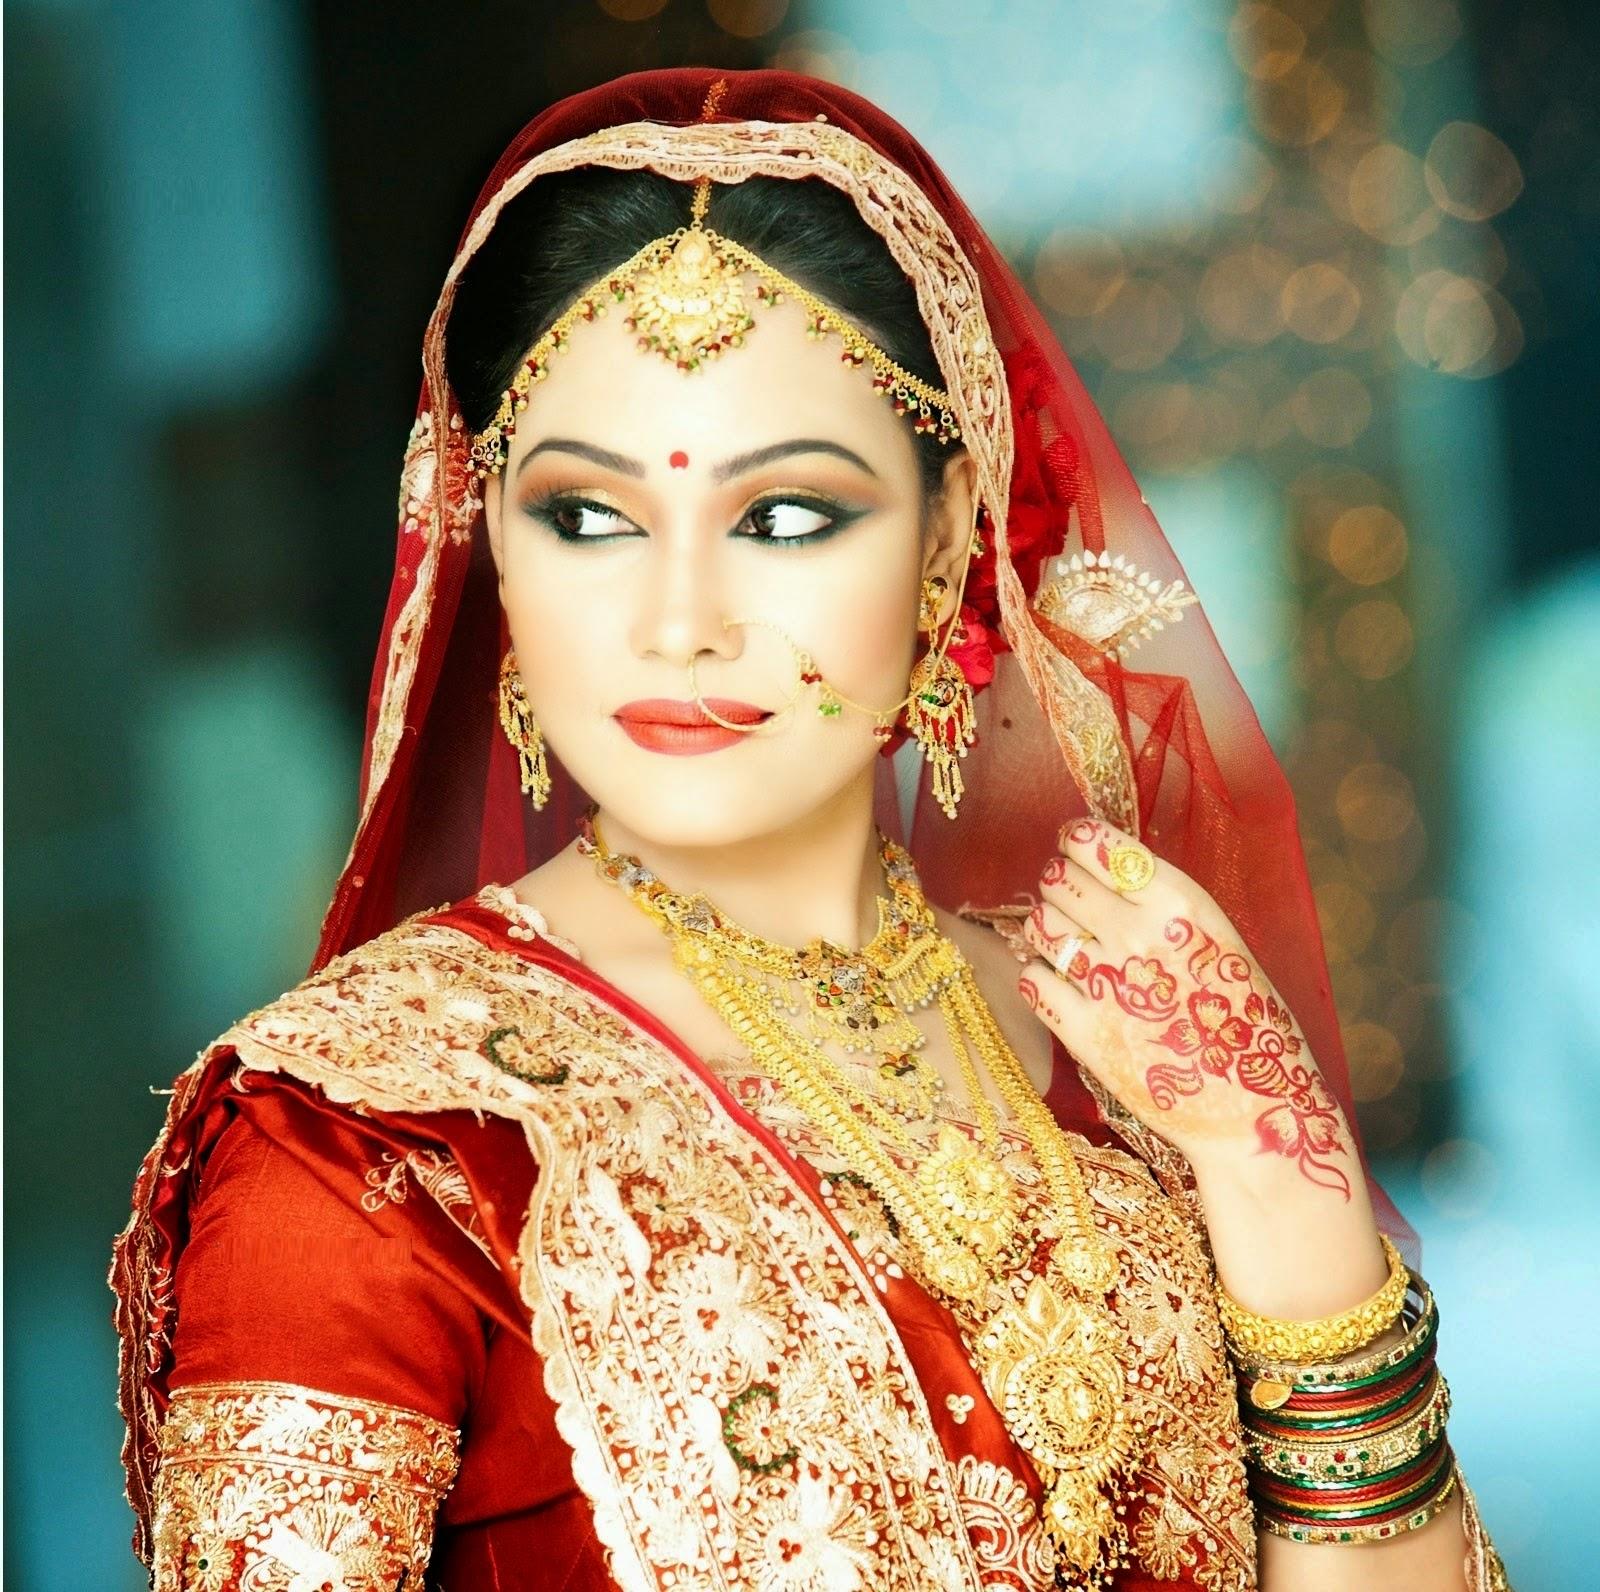 All 4u Wallpaper South Indian Bridal Wedding Jewelry 2014 2015 Hd Wallpaper